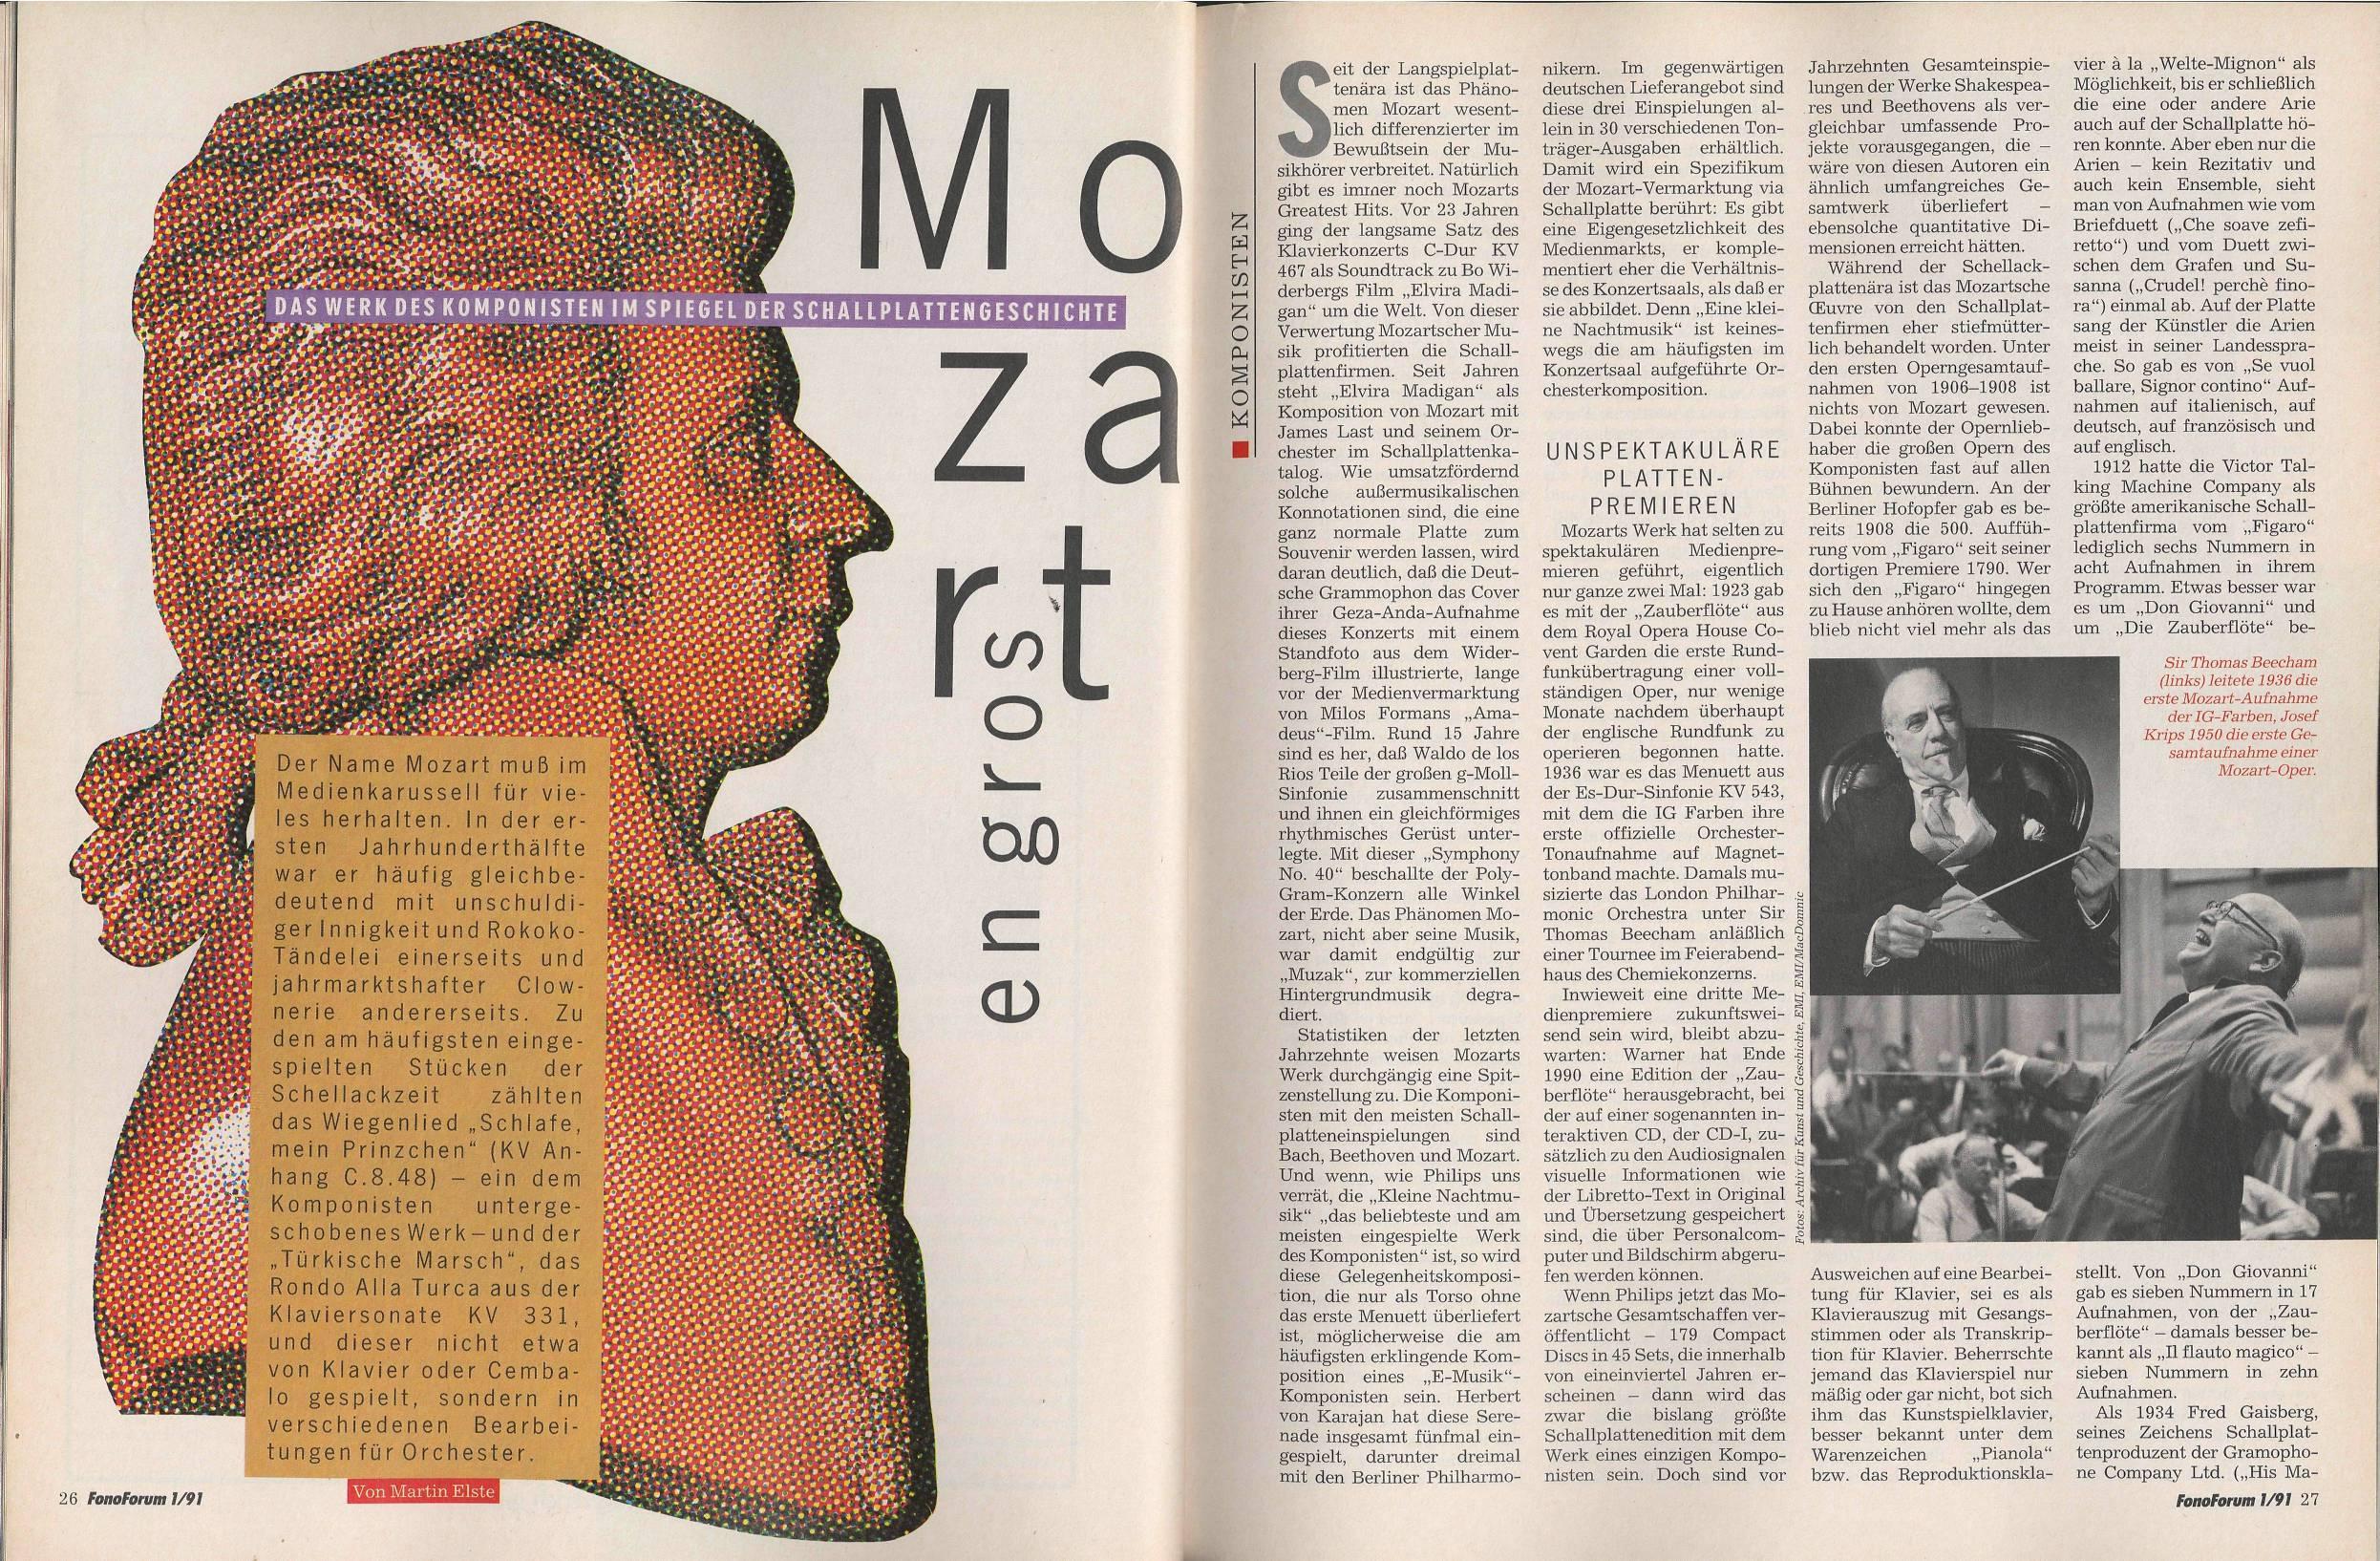 Mozart en gros